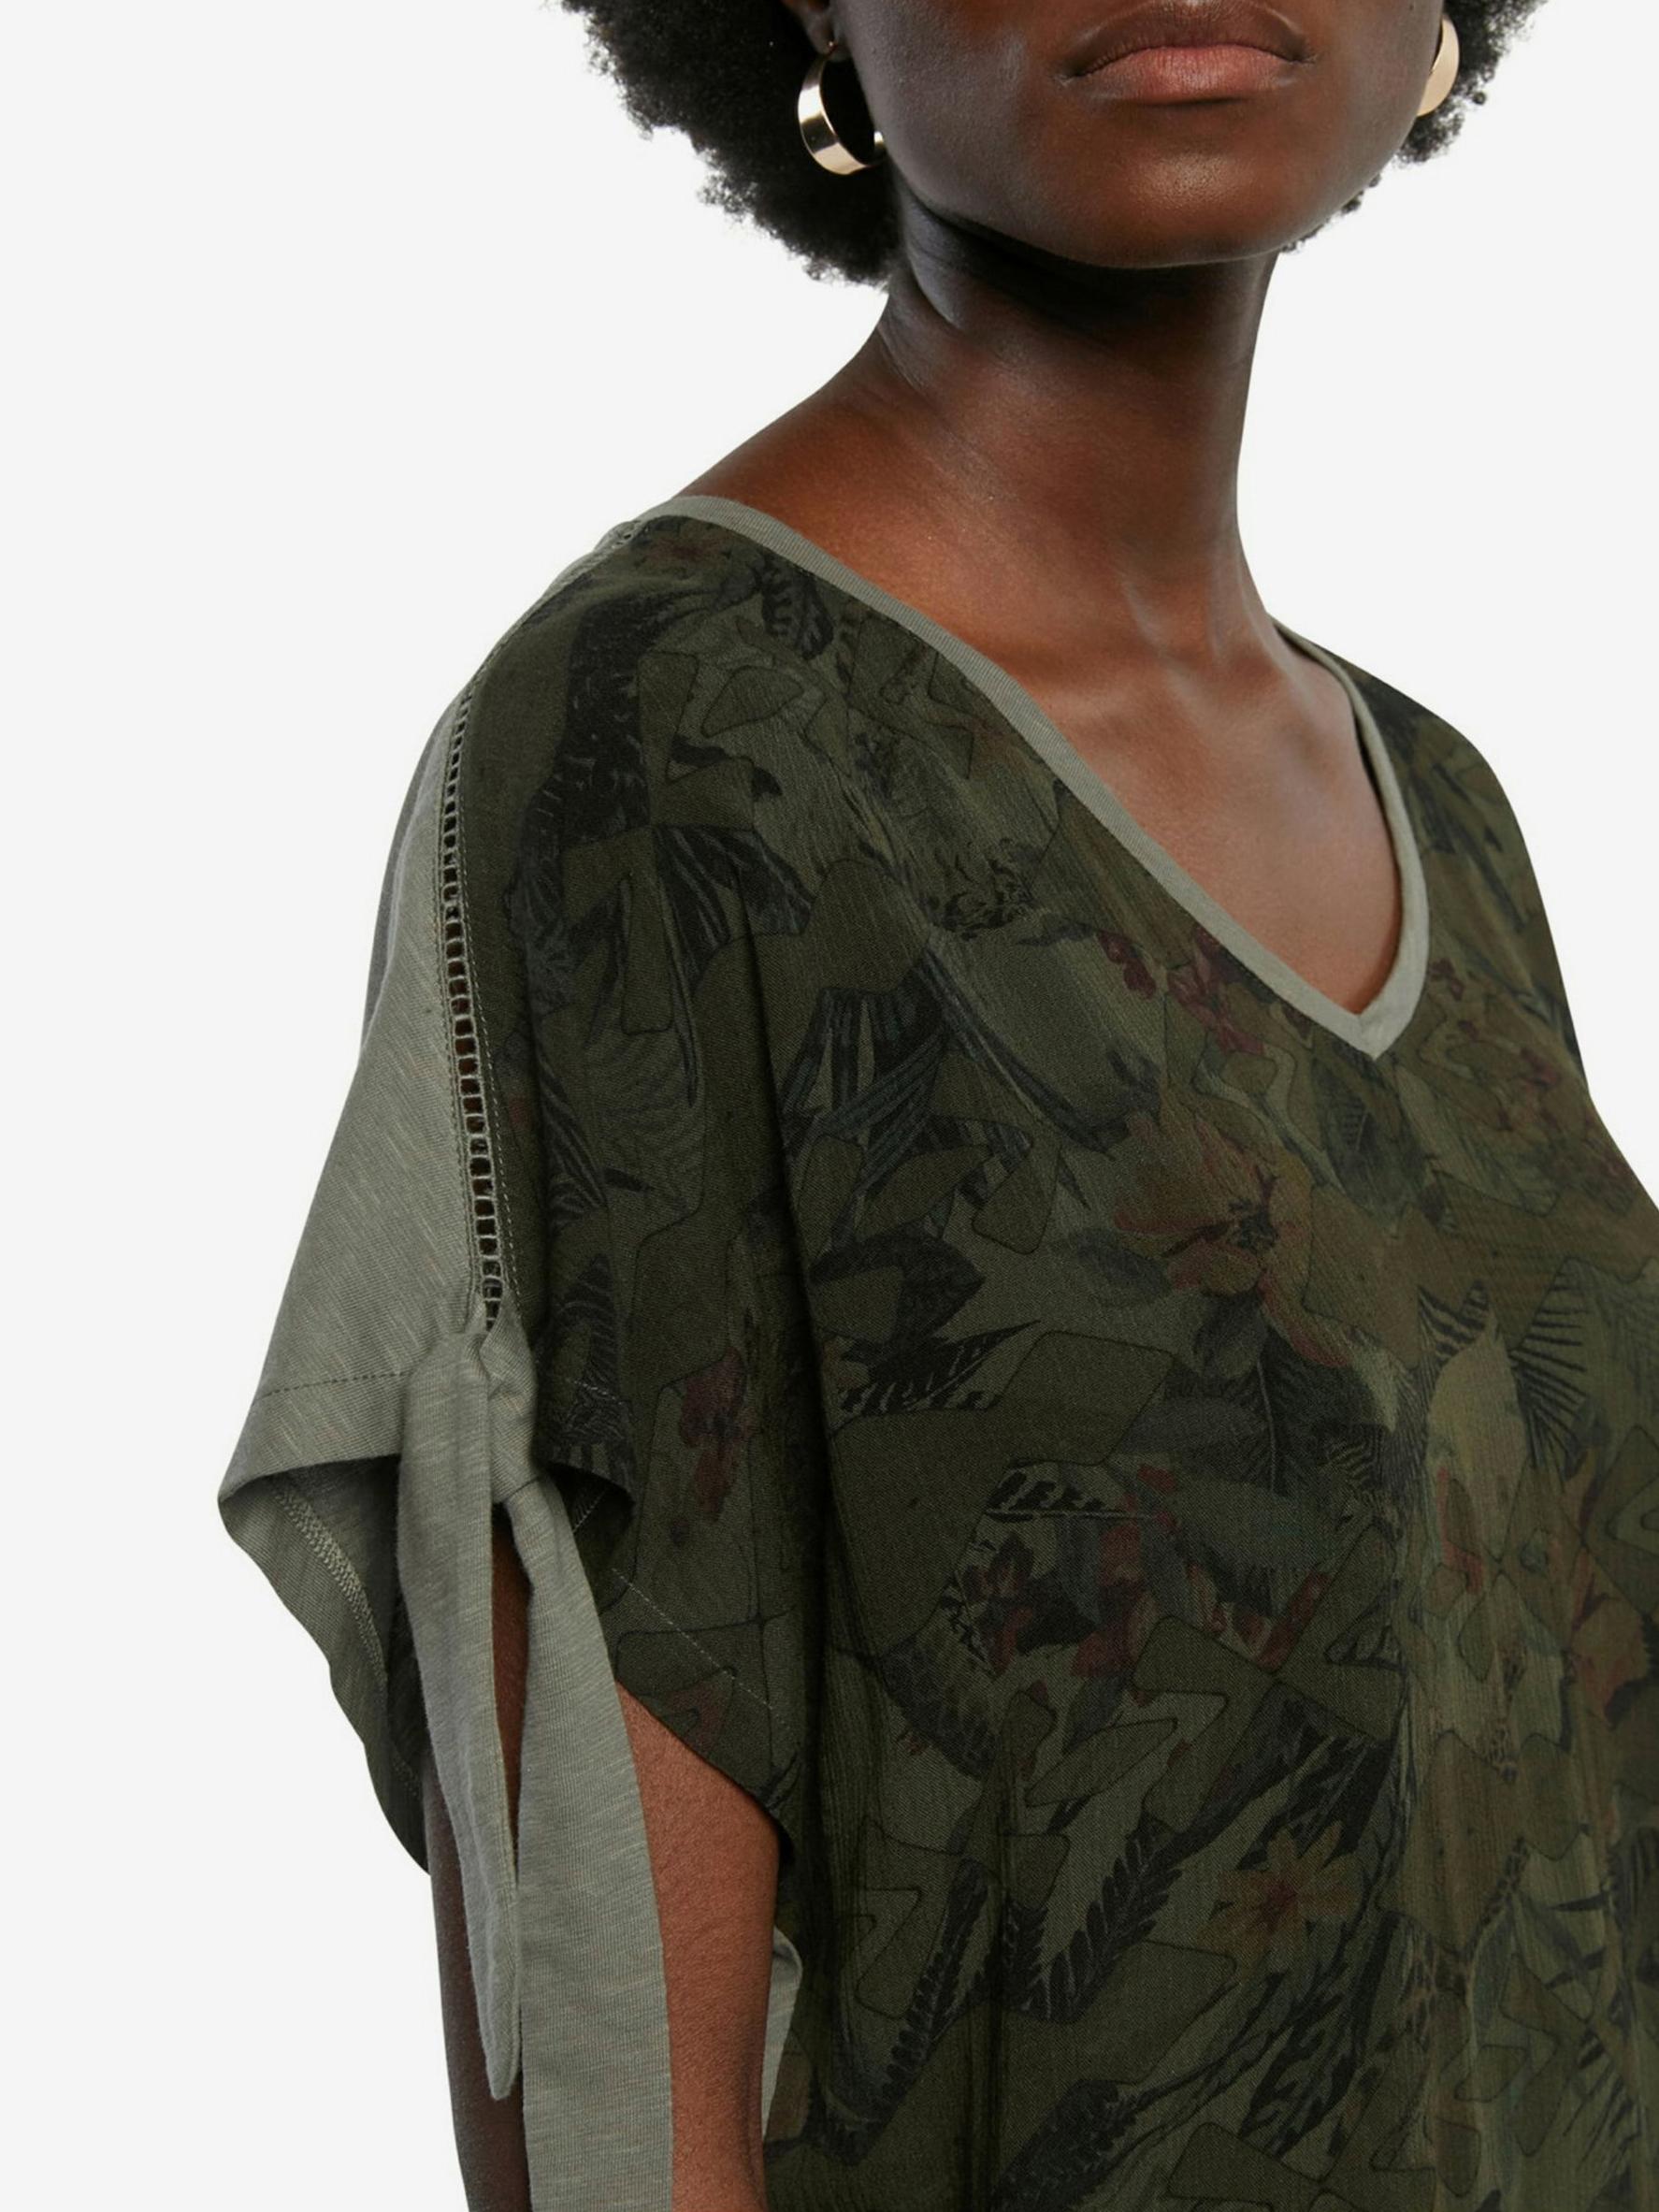 Desigual green blouse Staten Island